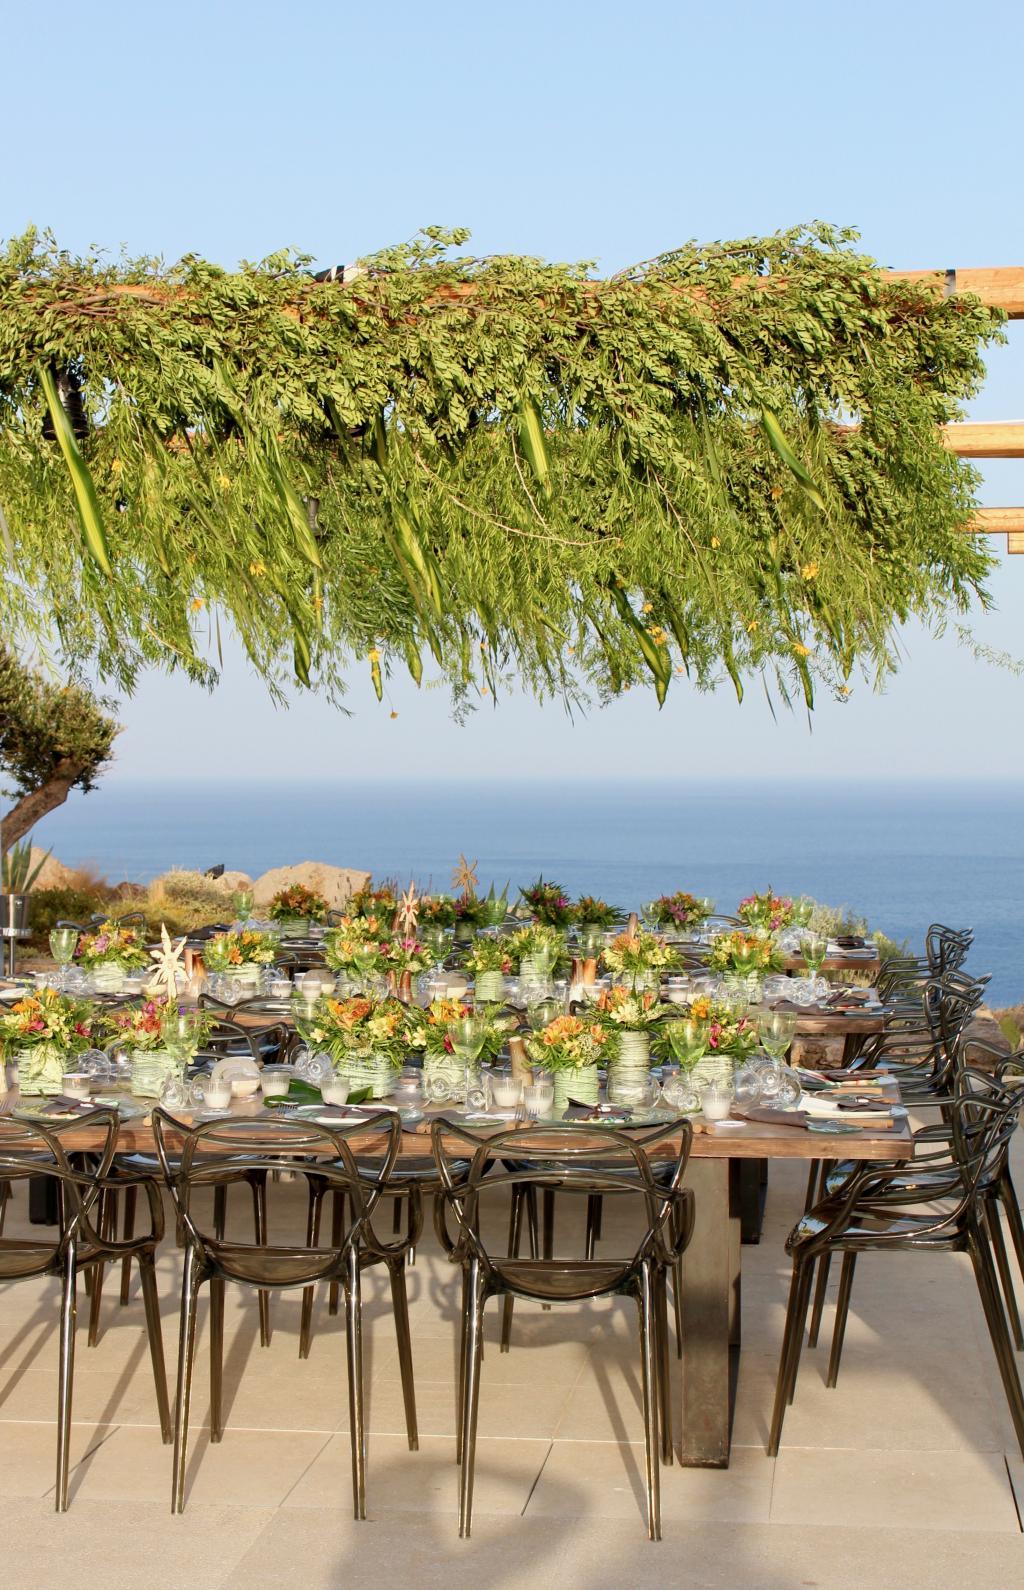 E&T Mykonos wedding - Image 11